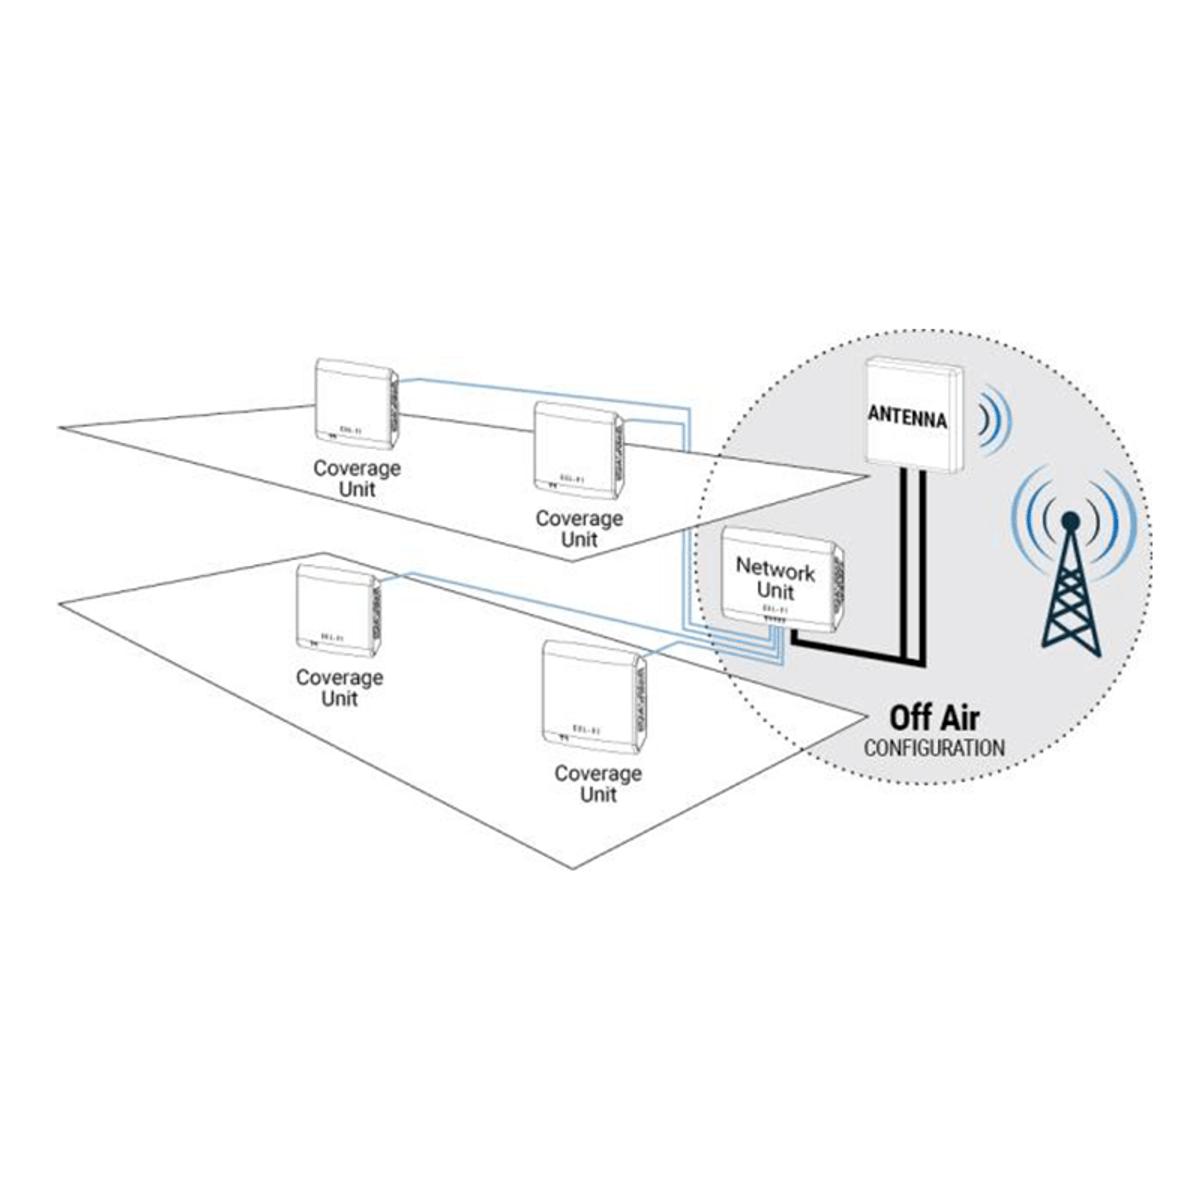 Cel-Fi QUATRA Coverage Unit (CU) for AT&T